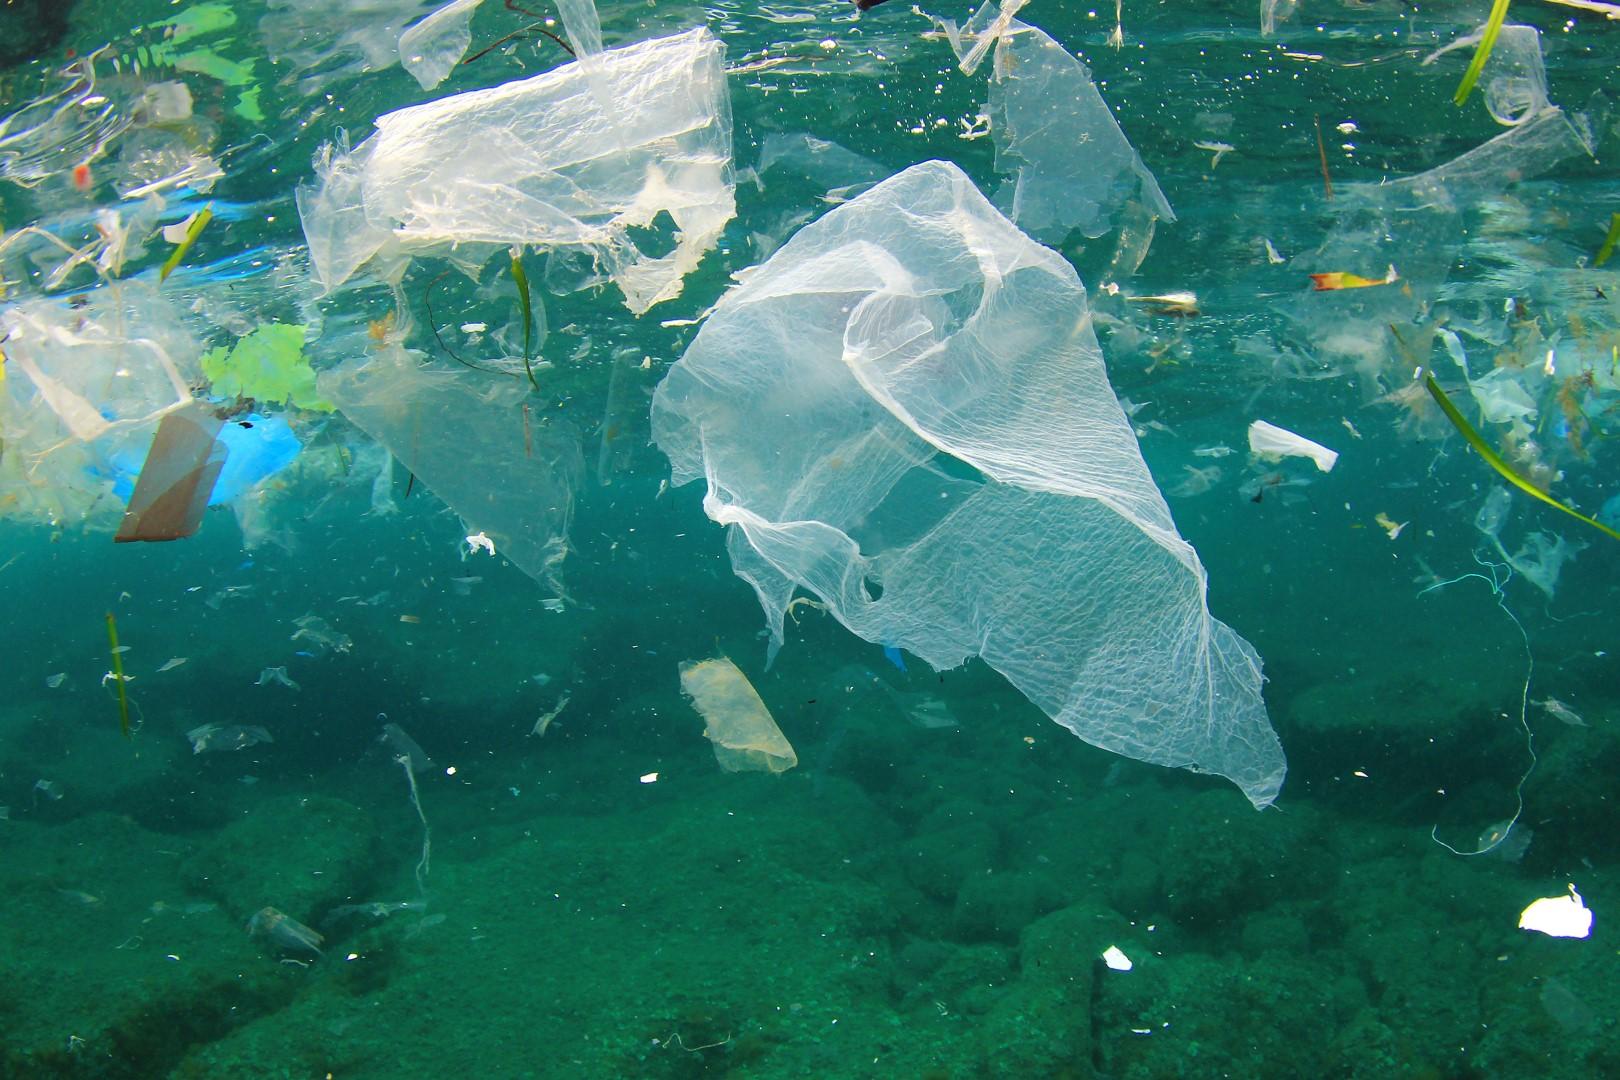 Ocean_poluttion_rubbish